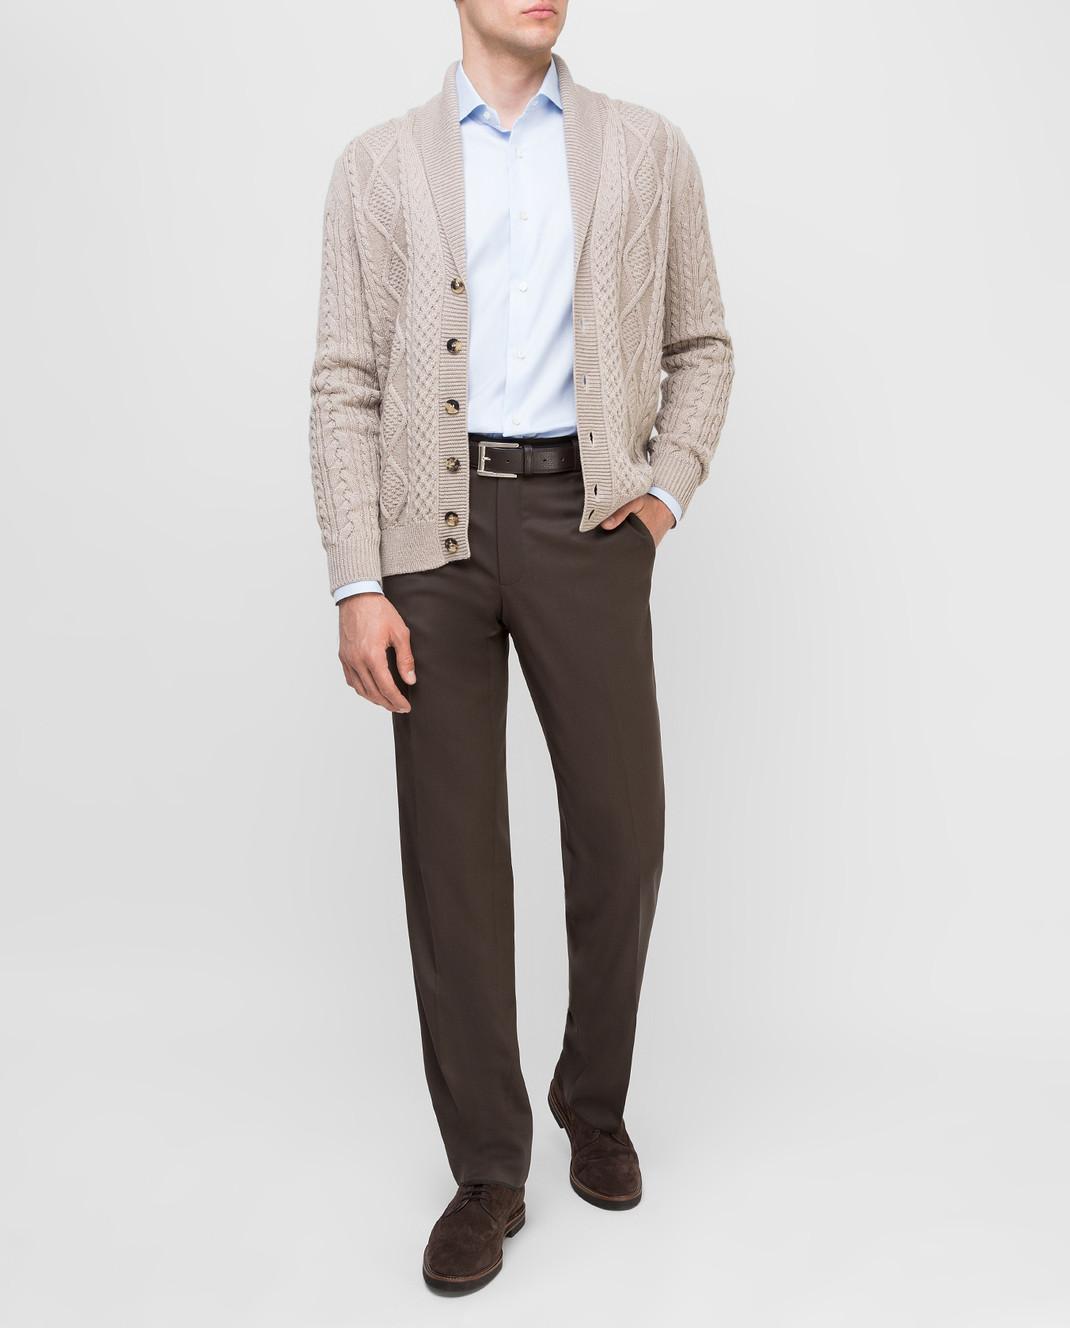 Castello d'Oro Темно-коричневые брюки из шерсти изображение 2